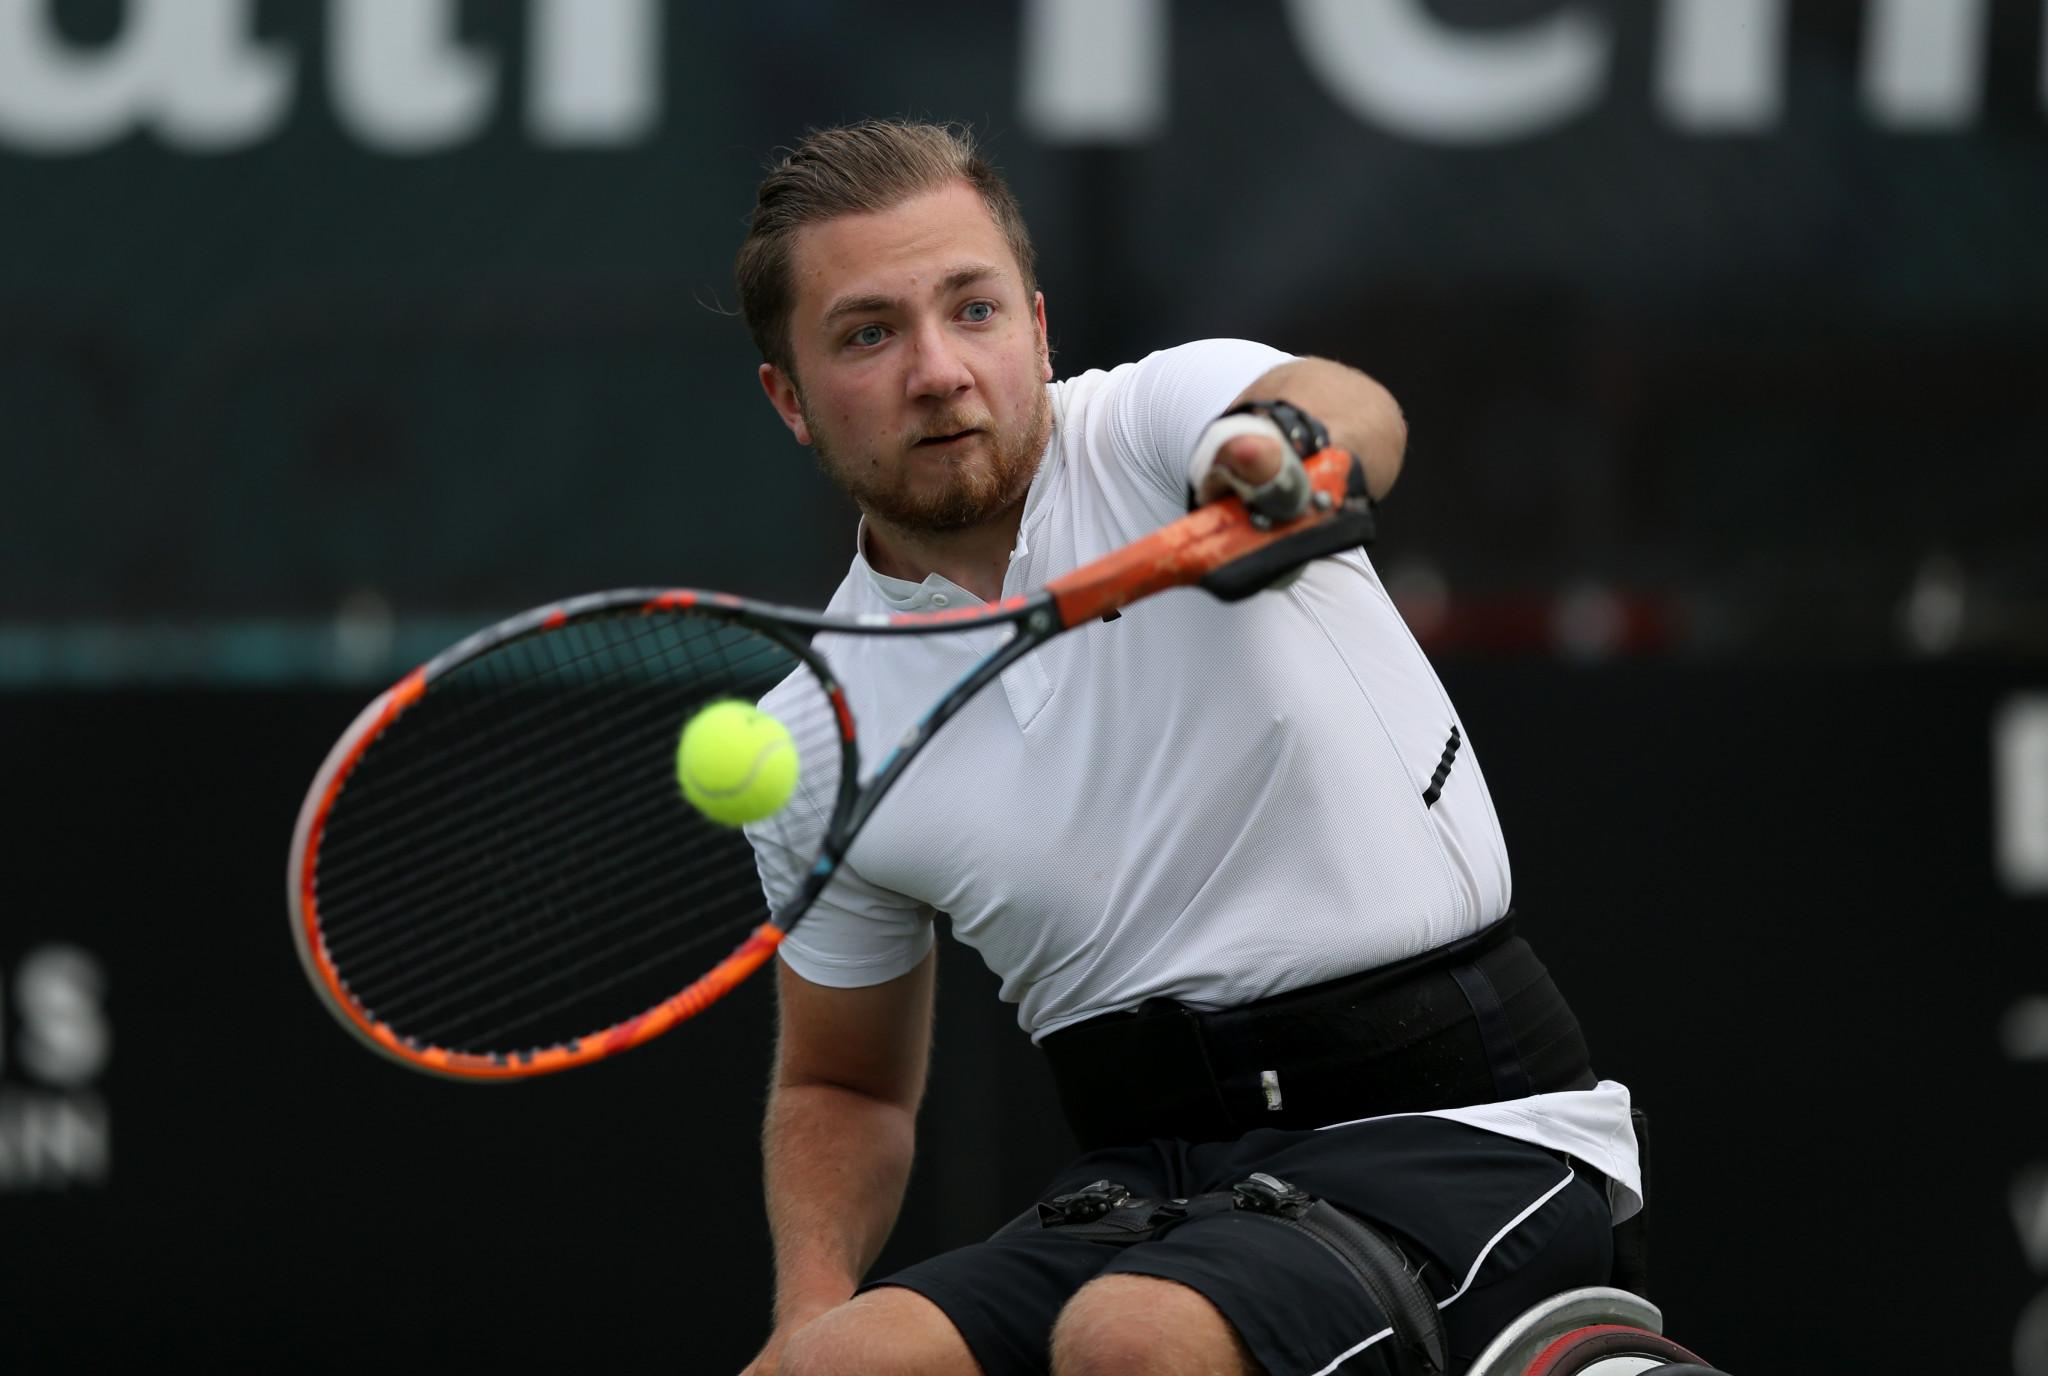 Schröder among four new faces joining ITF Wheelchair Tennis Player Council